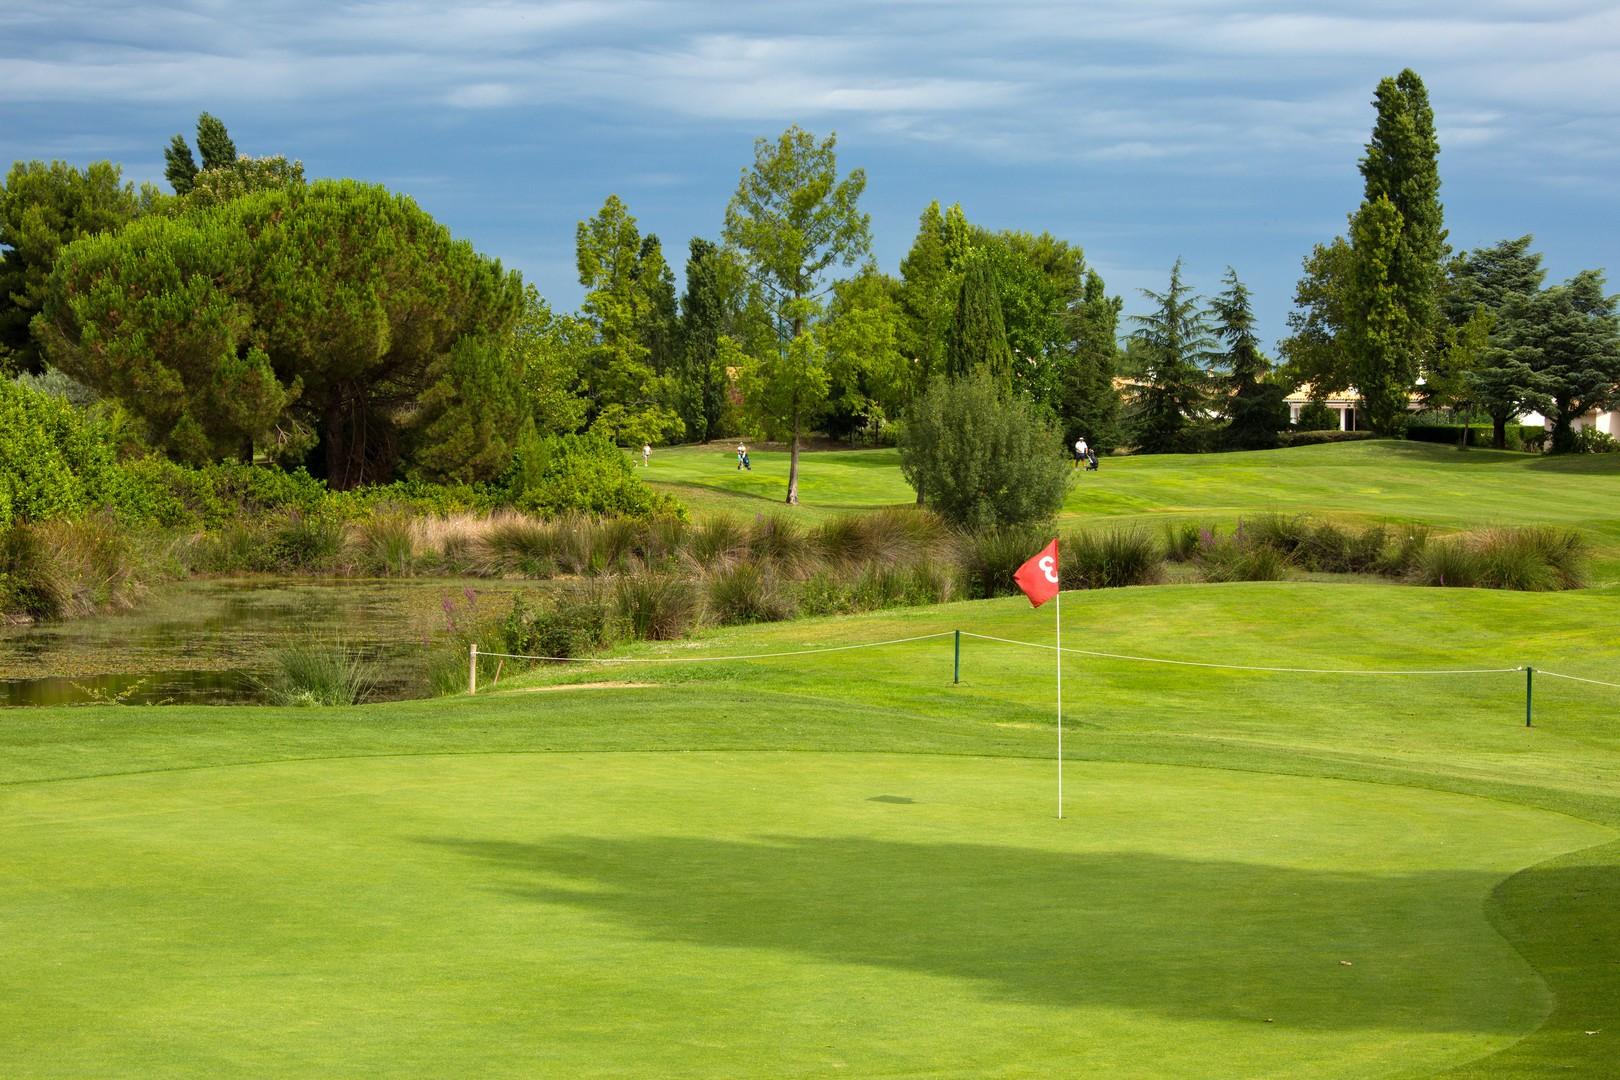 golf-expedition-golf-reizen-frankrijk-regio-languedoc-roussillon-domaine-de-verchant-golfbaan-green-water-hazard